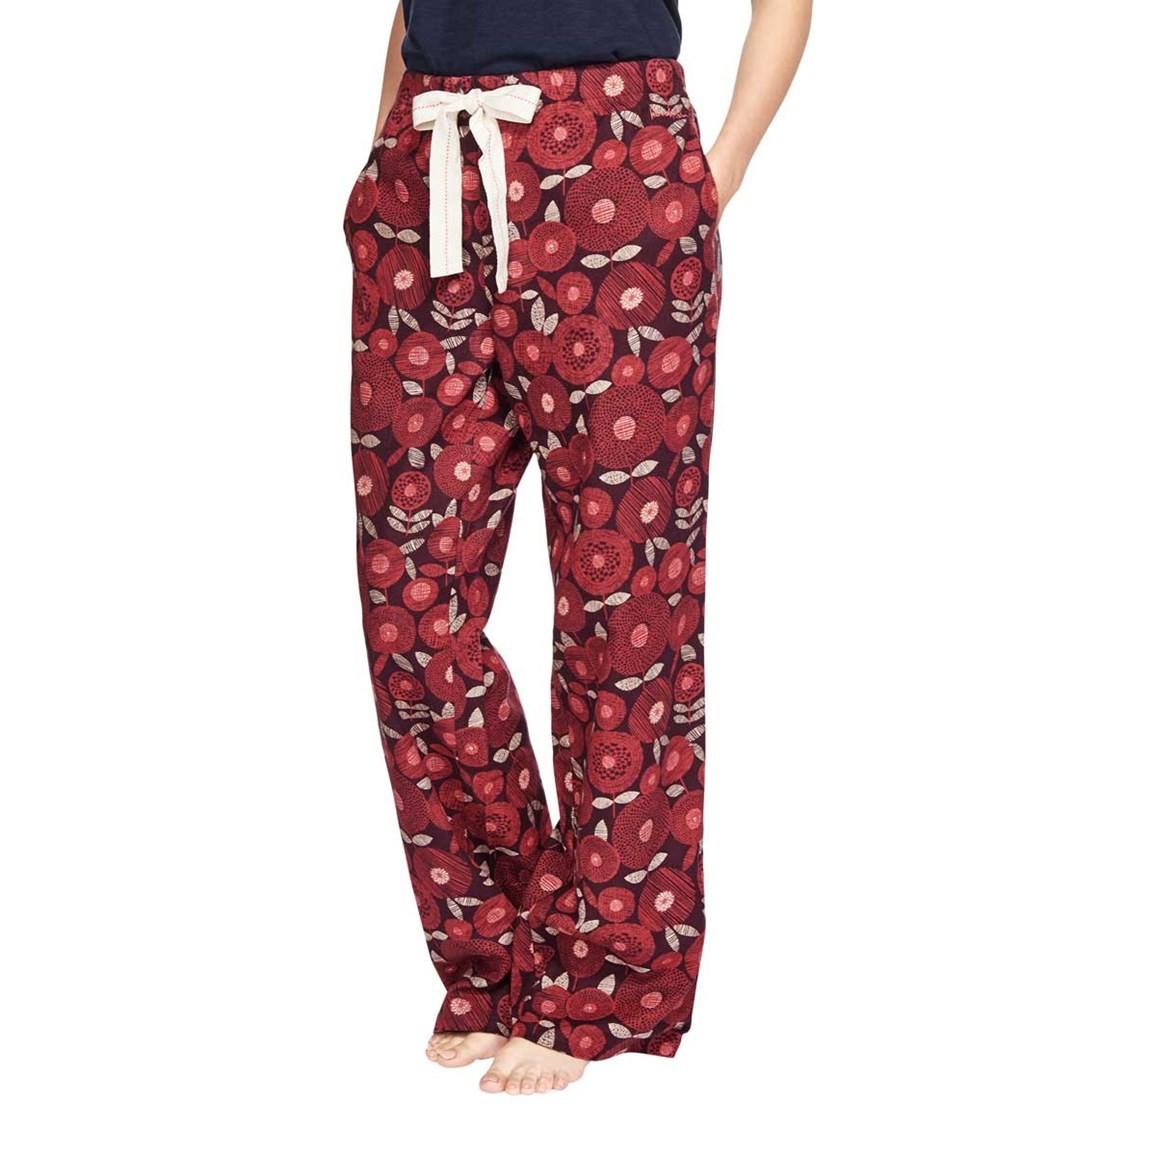 Iceland Cotton Printed Pyjama Bottoms Boysenberry